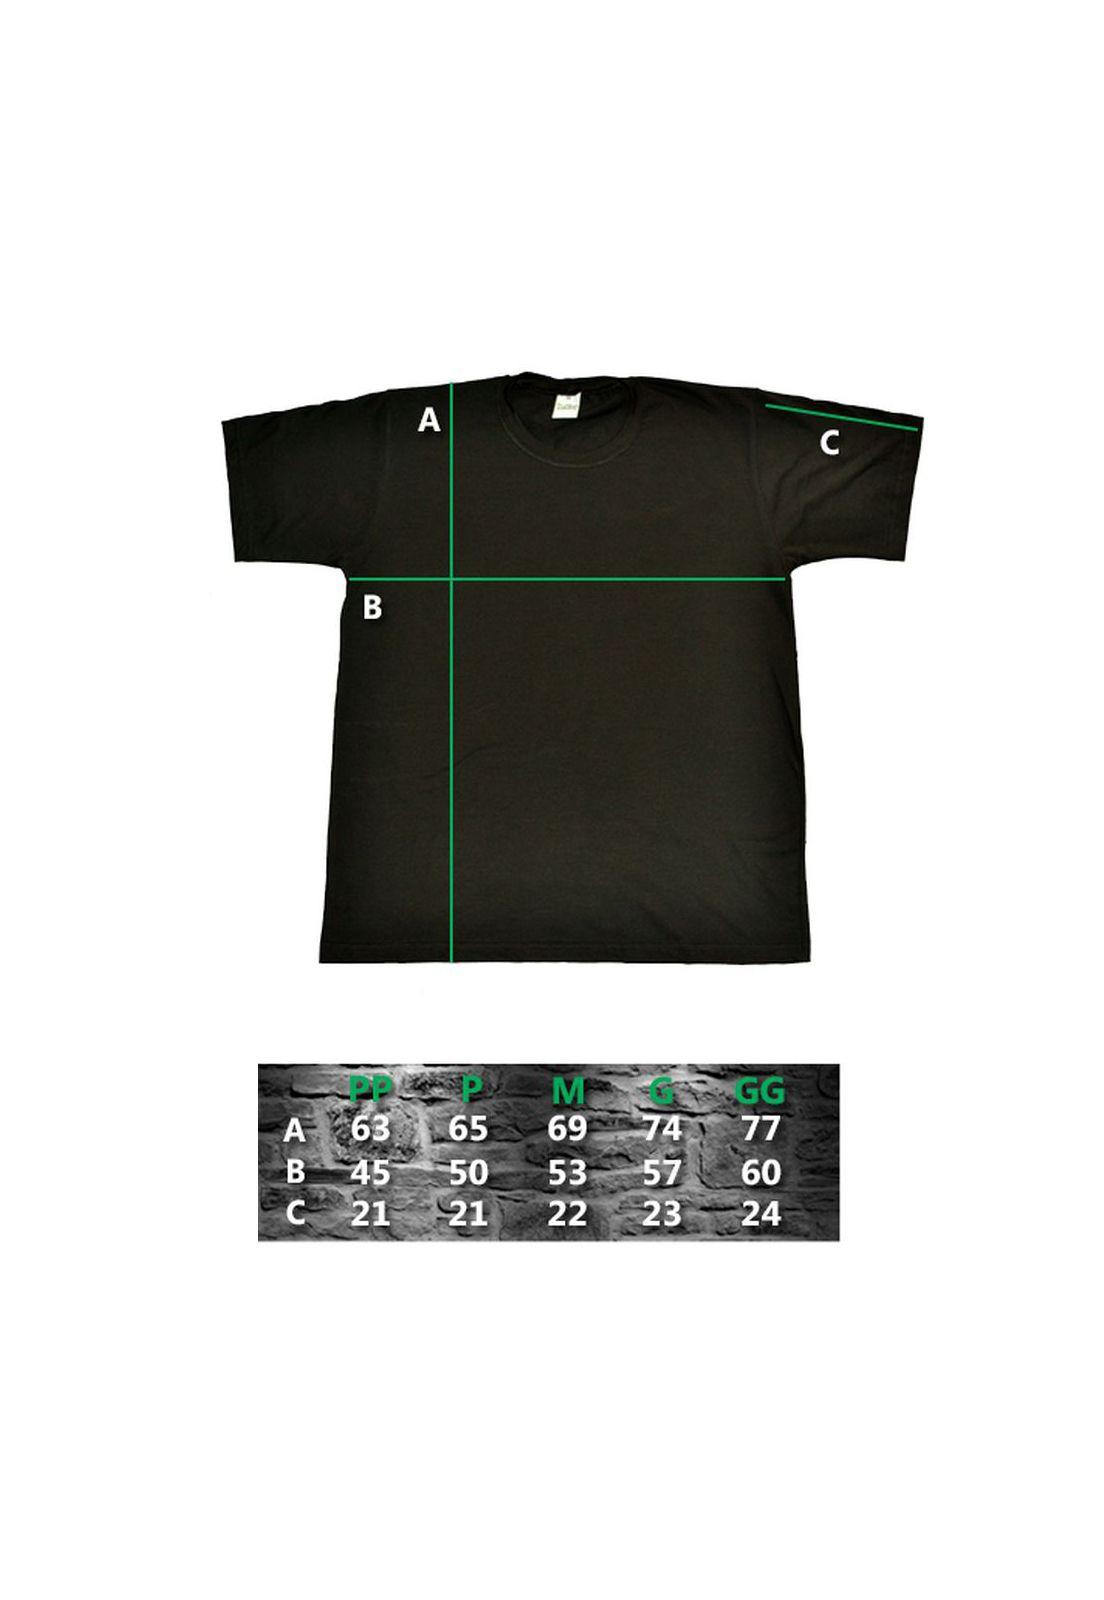 Camiseta The Warriors - Brooklyn - Vinho  - HShop